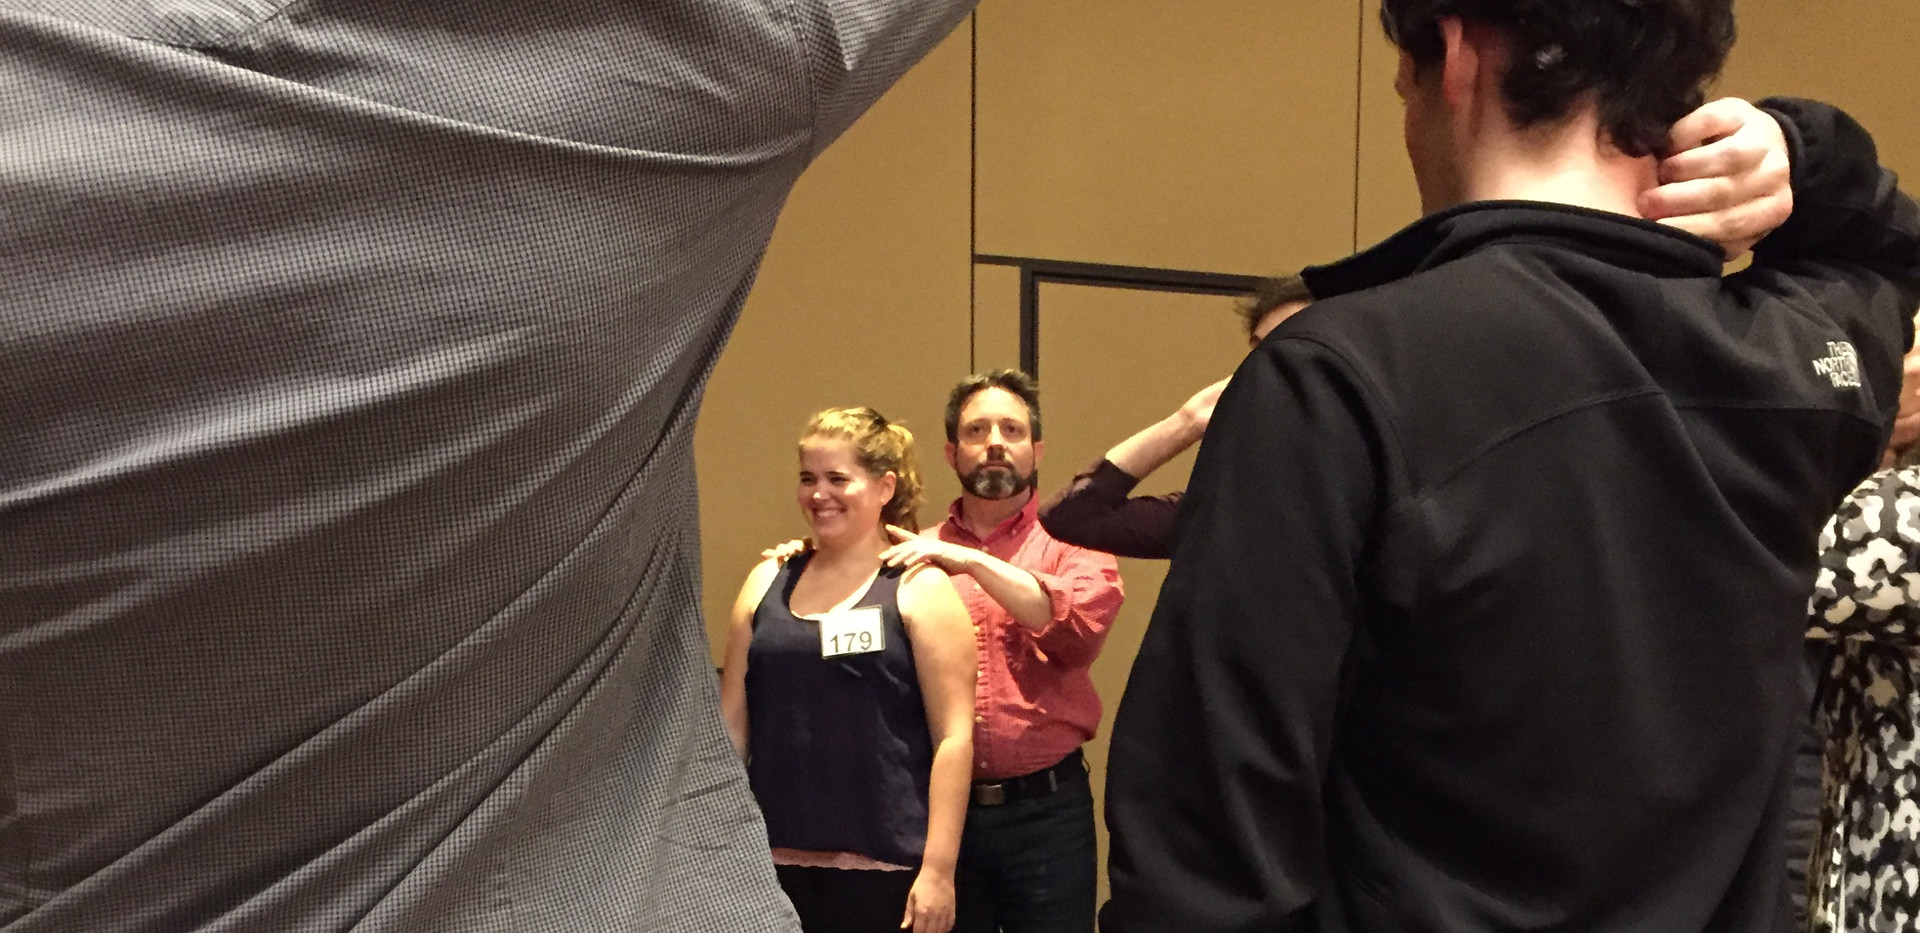 Alexander Technique Workshop - Southeastern Theatre Conference